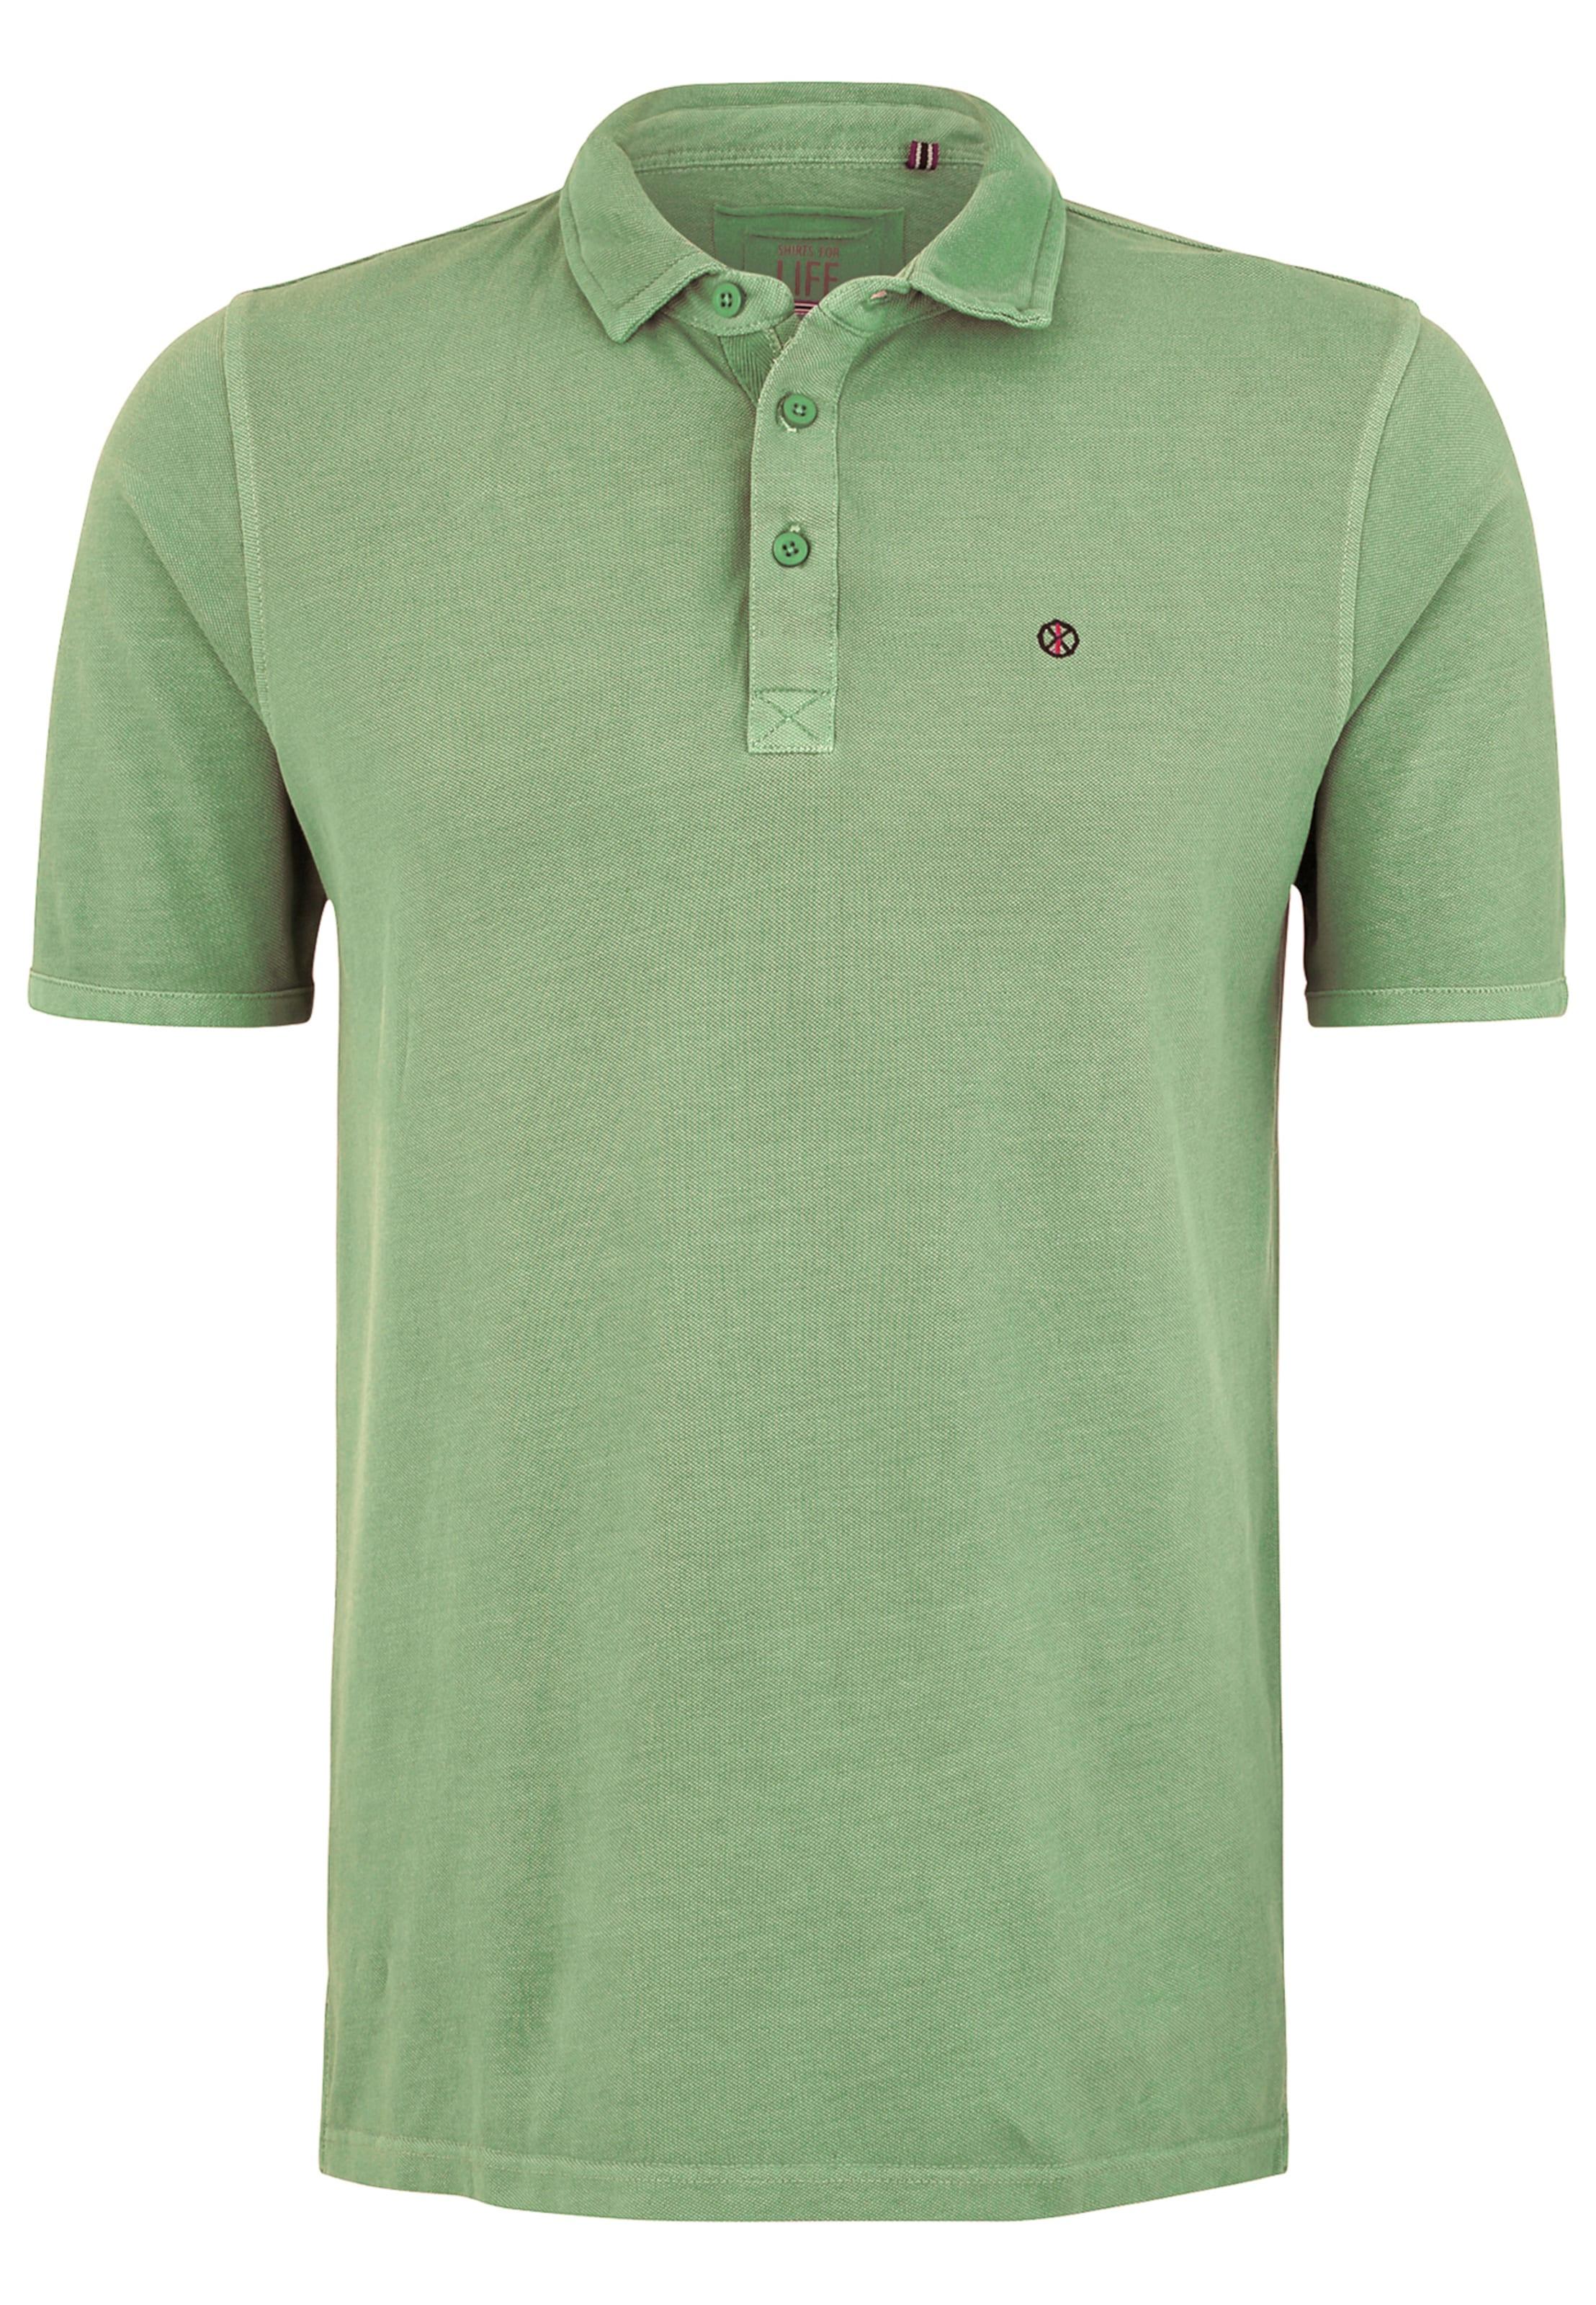 For 'liam' Poloshirt In Grün Life Shirts rxWBdCoe